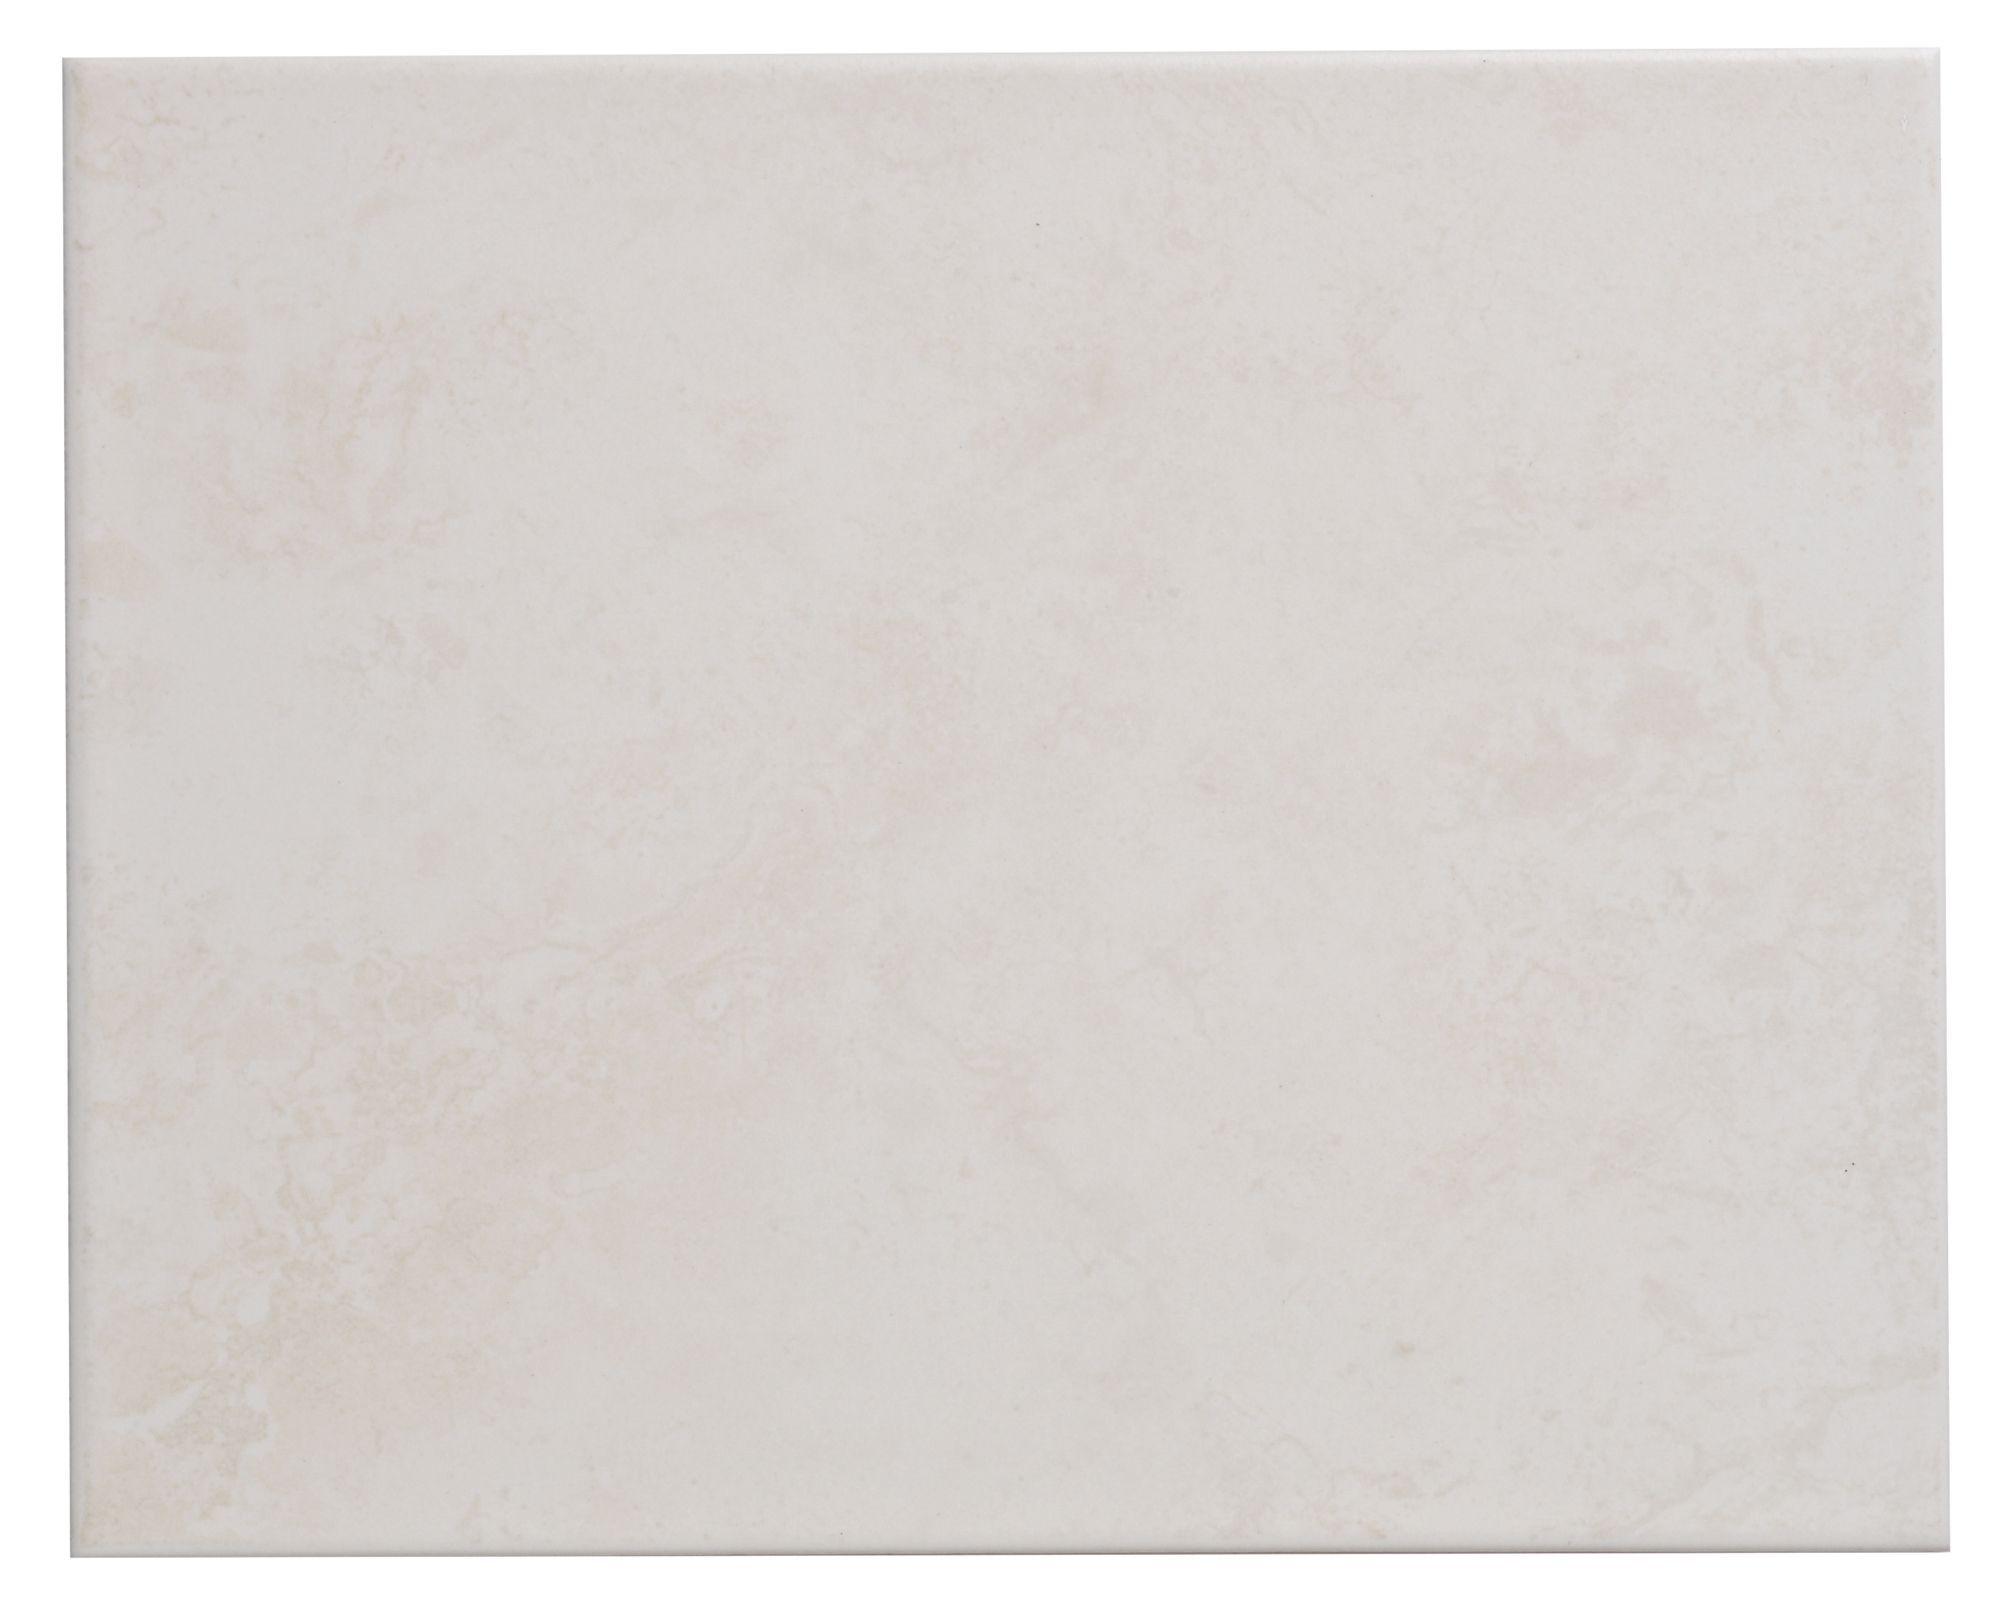 Helena Light Beige Ceramic Wall Tile, Pack Of 20, (l)250mm (w)200mm